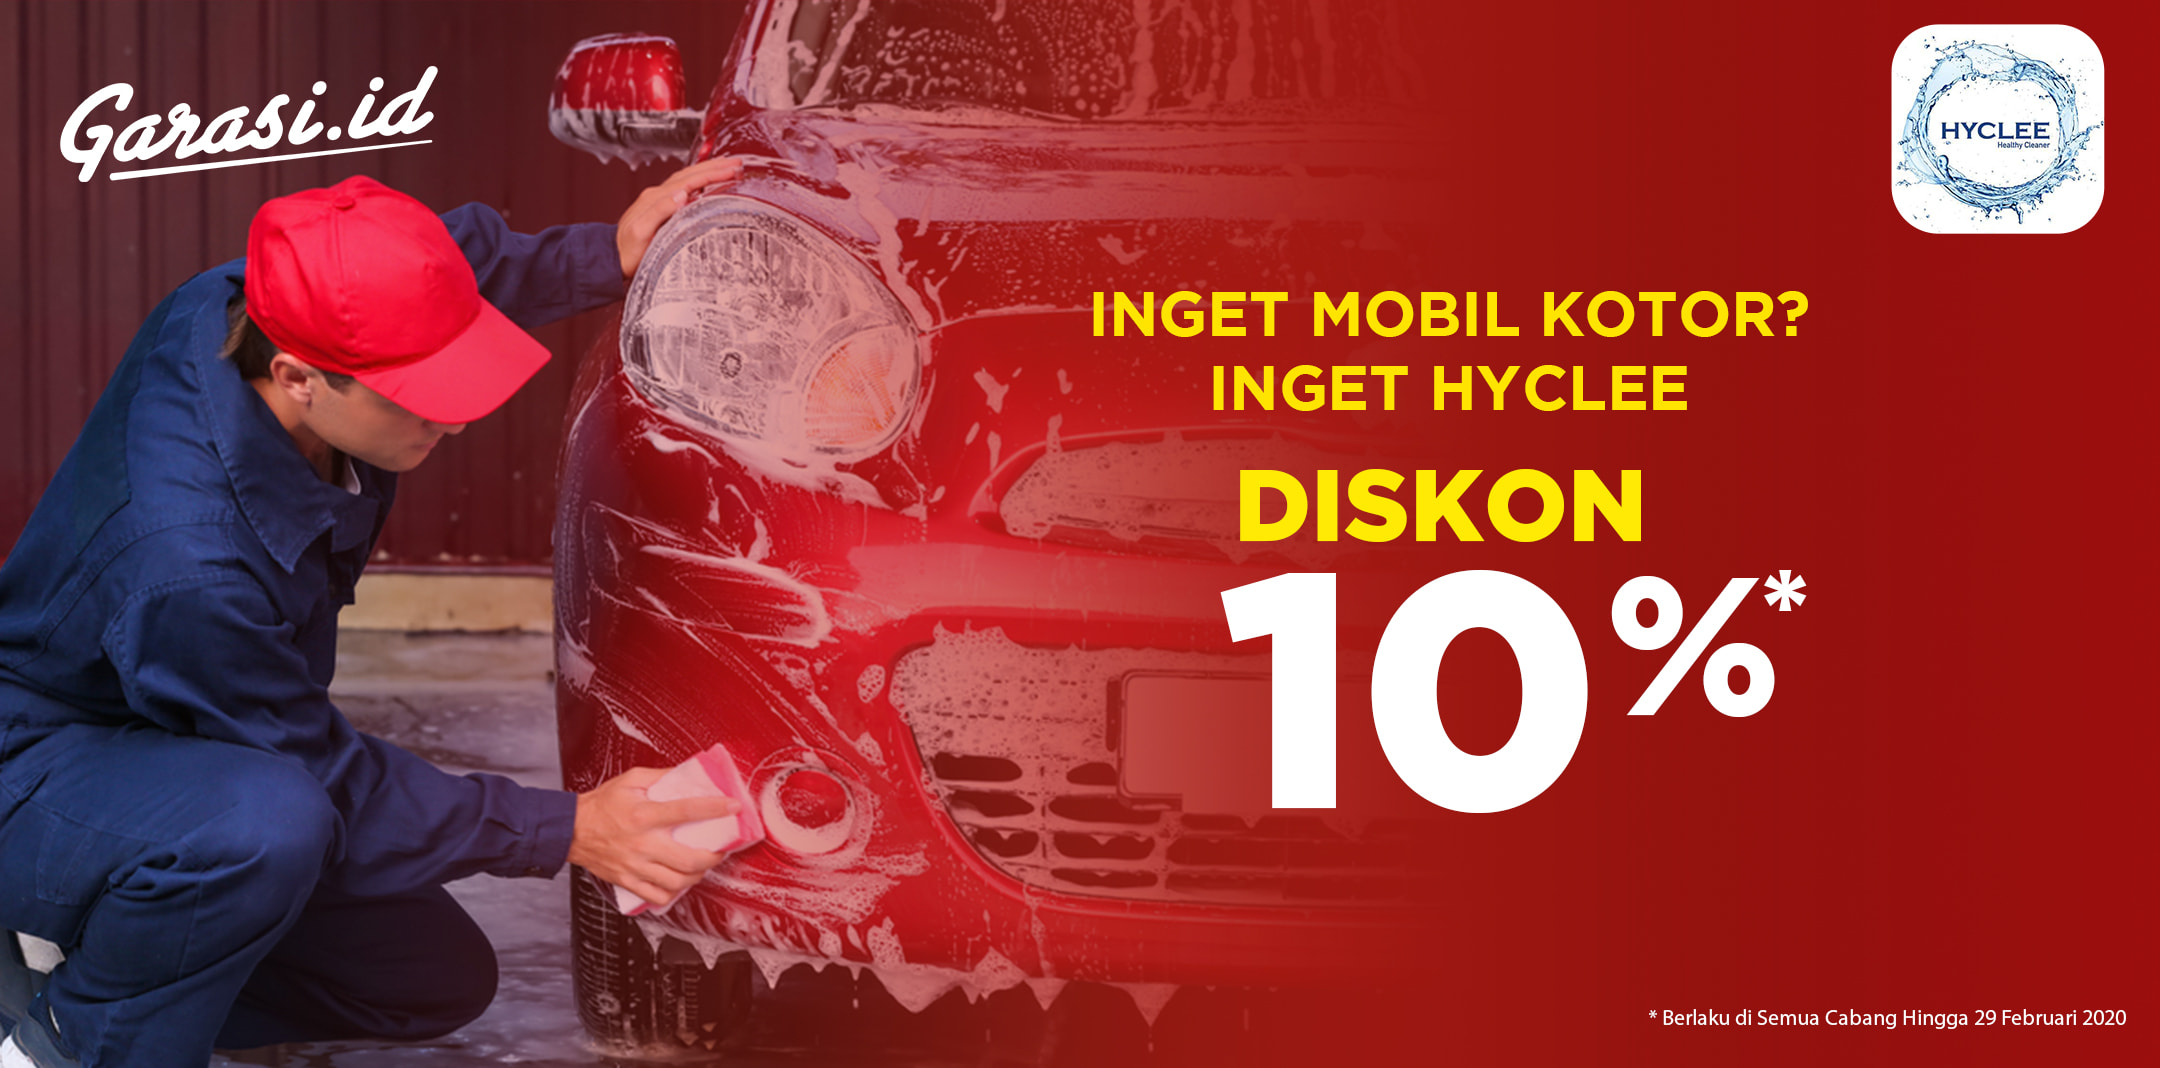 **Home Service** Cocok buat kalian yang sibuk, dapatkan promo 10% cuci mobil  di Hyclee